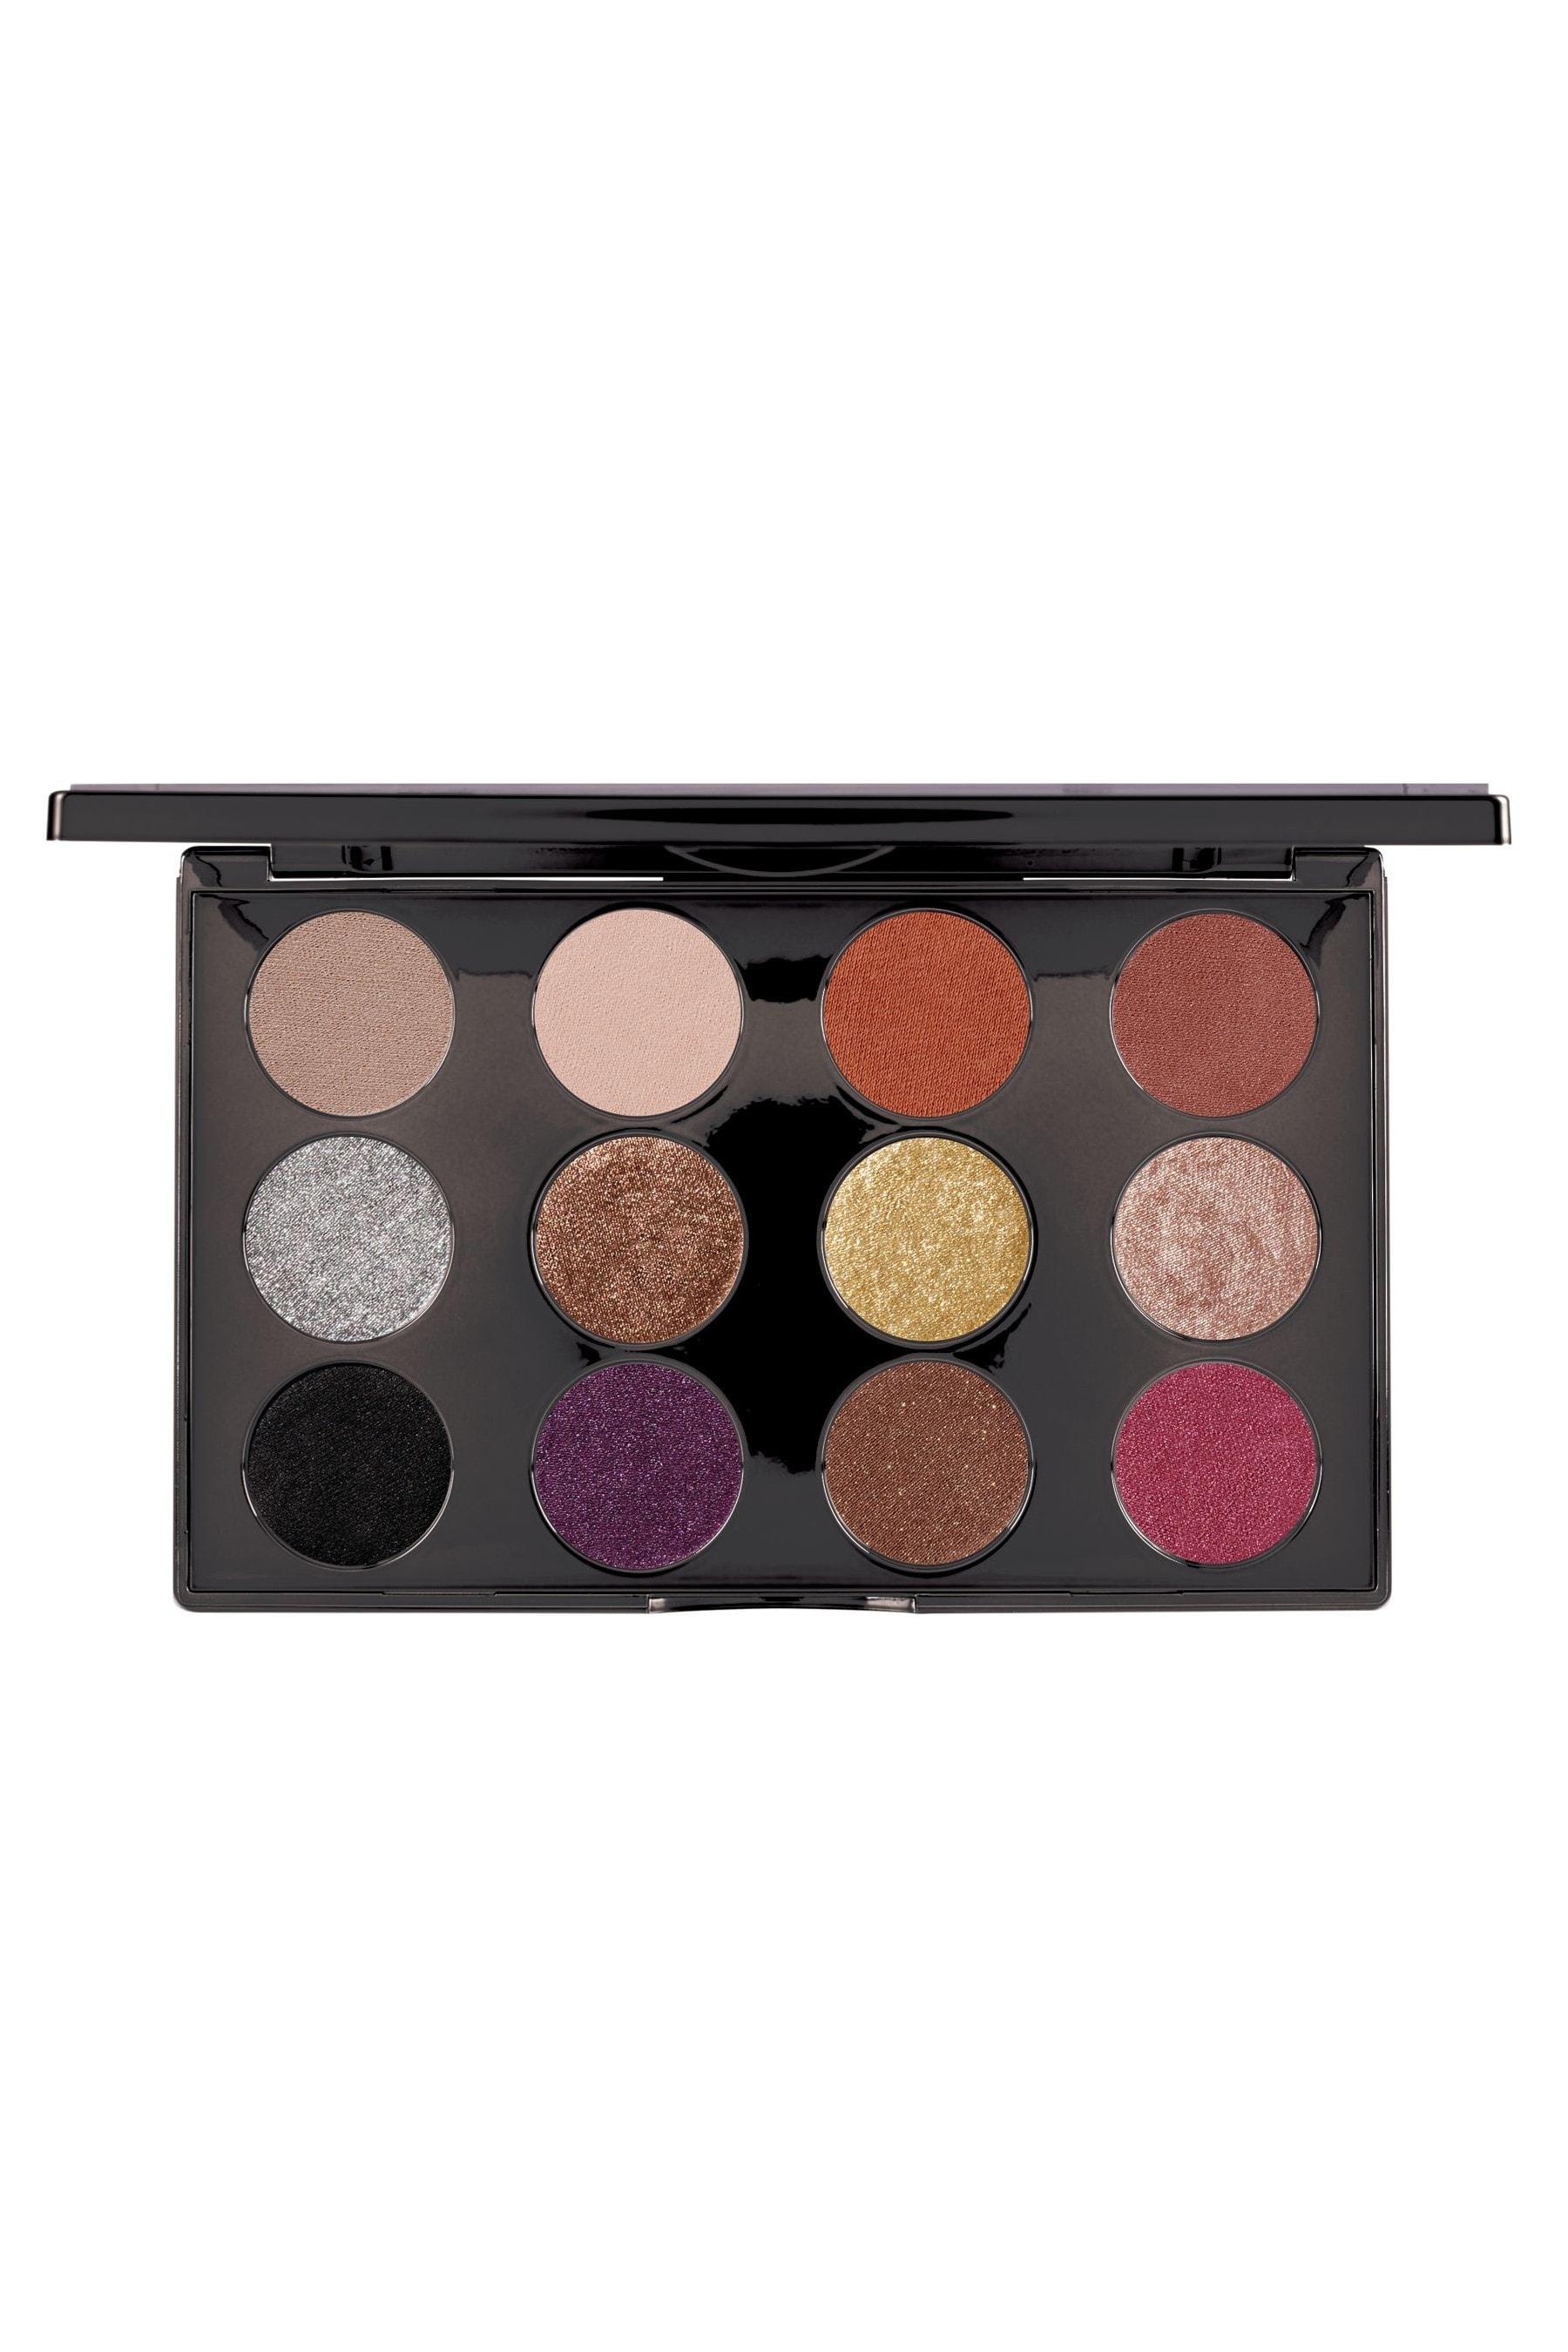 Buy NYX Professional Make Up 3C Colour Correcting Palette